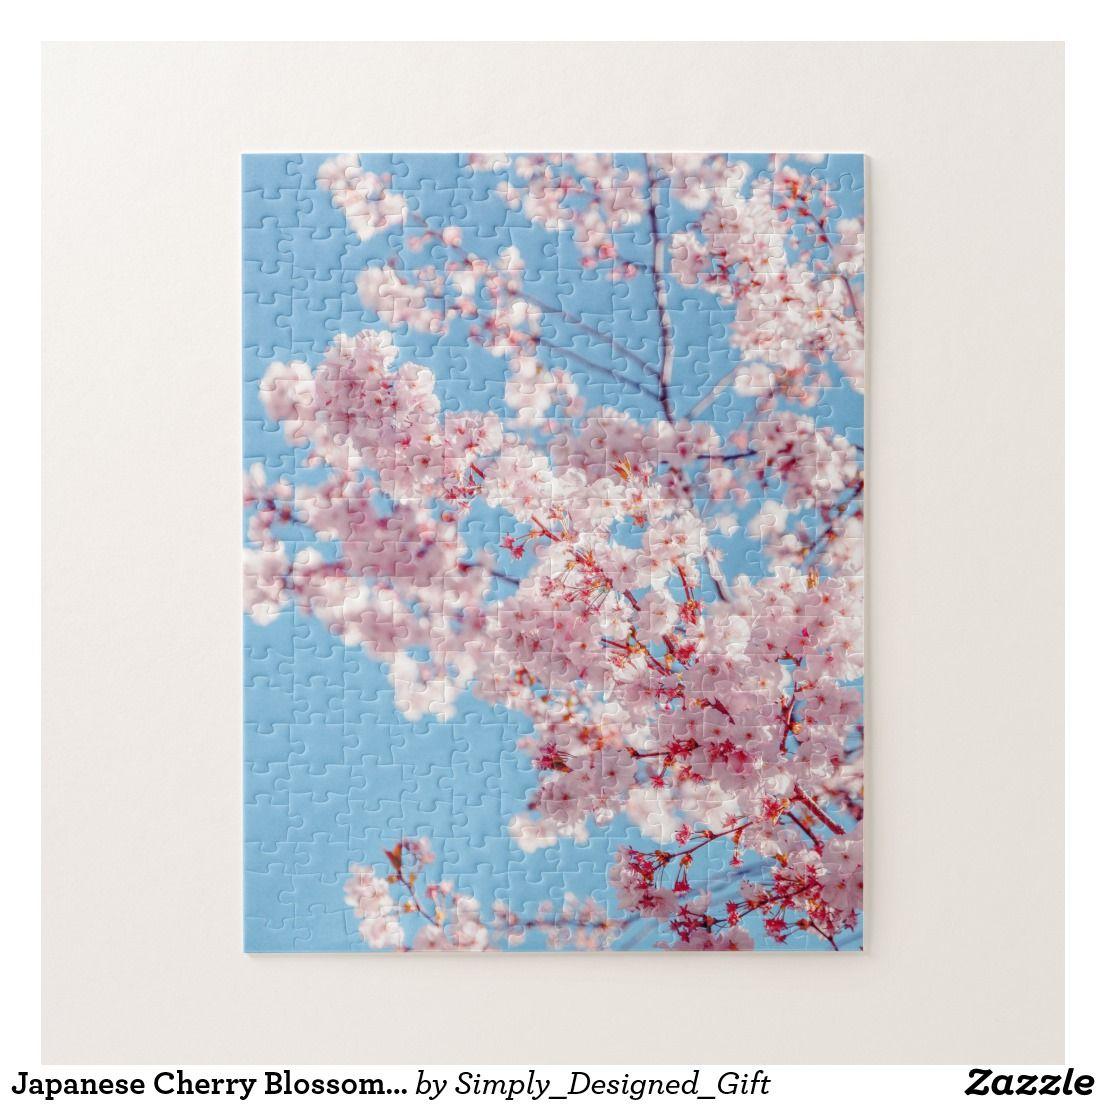 Japanese Cherry Blossom Tree Jigsaw Puzzle Zazzle Com In 2021 Cherry Blossom Painting Cherry Blossom Tree Cherry Blossom Art